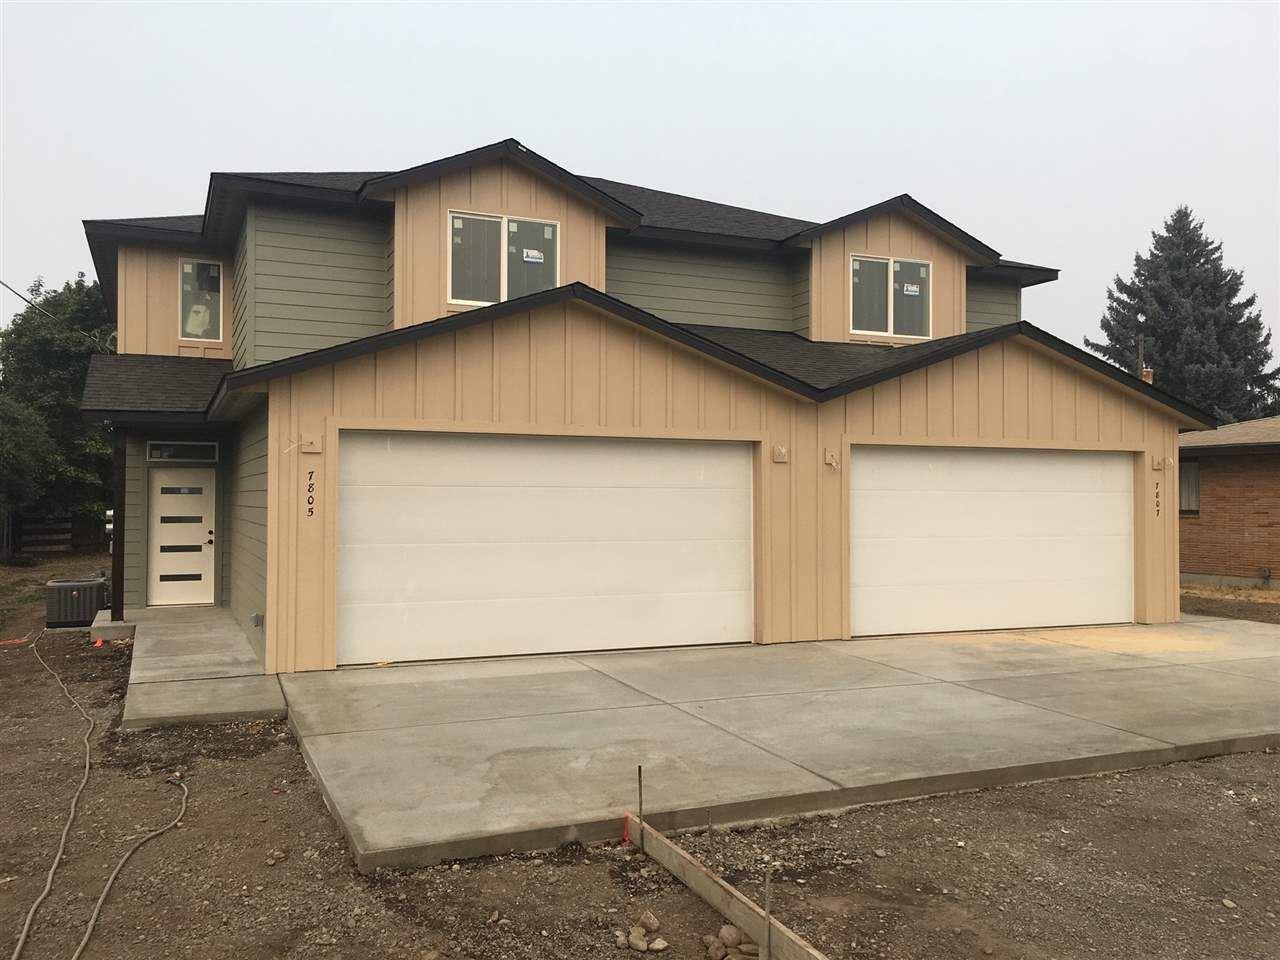 7805 E Baldwin Ave, Spokane, WA 99206 - #: 202022234